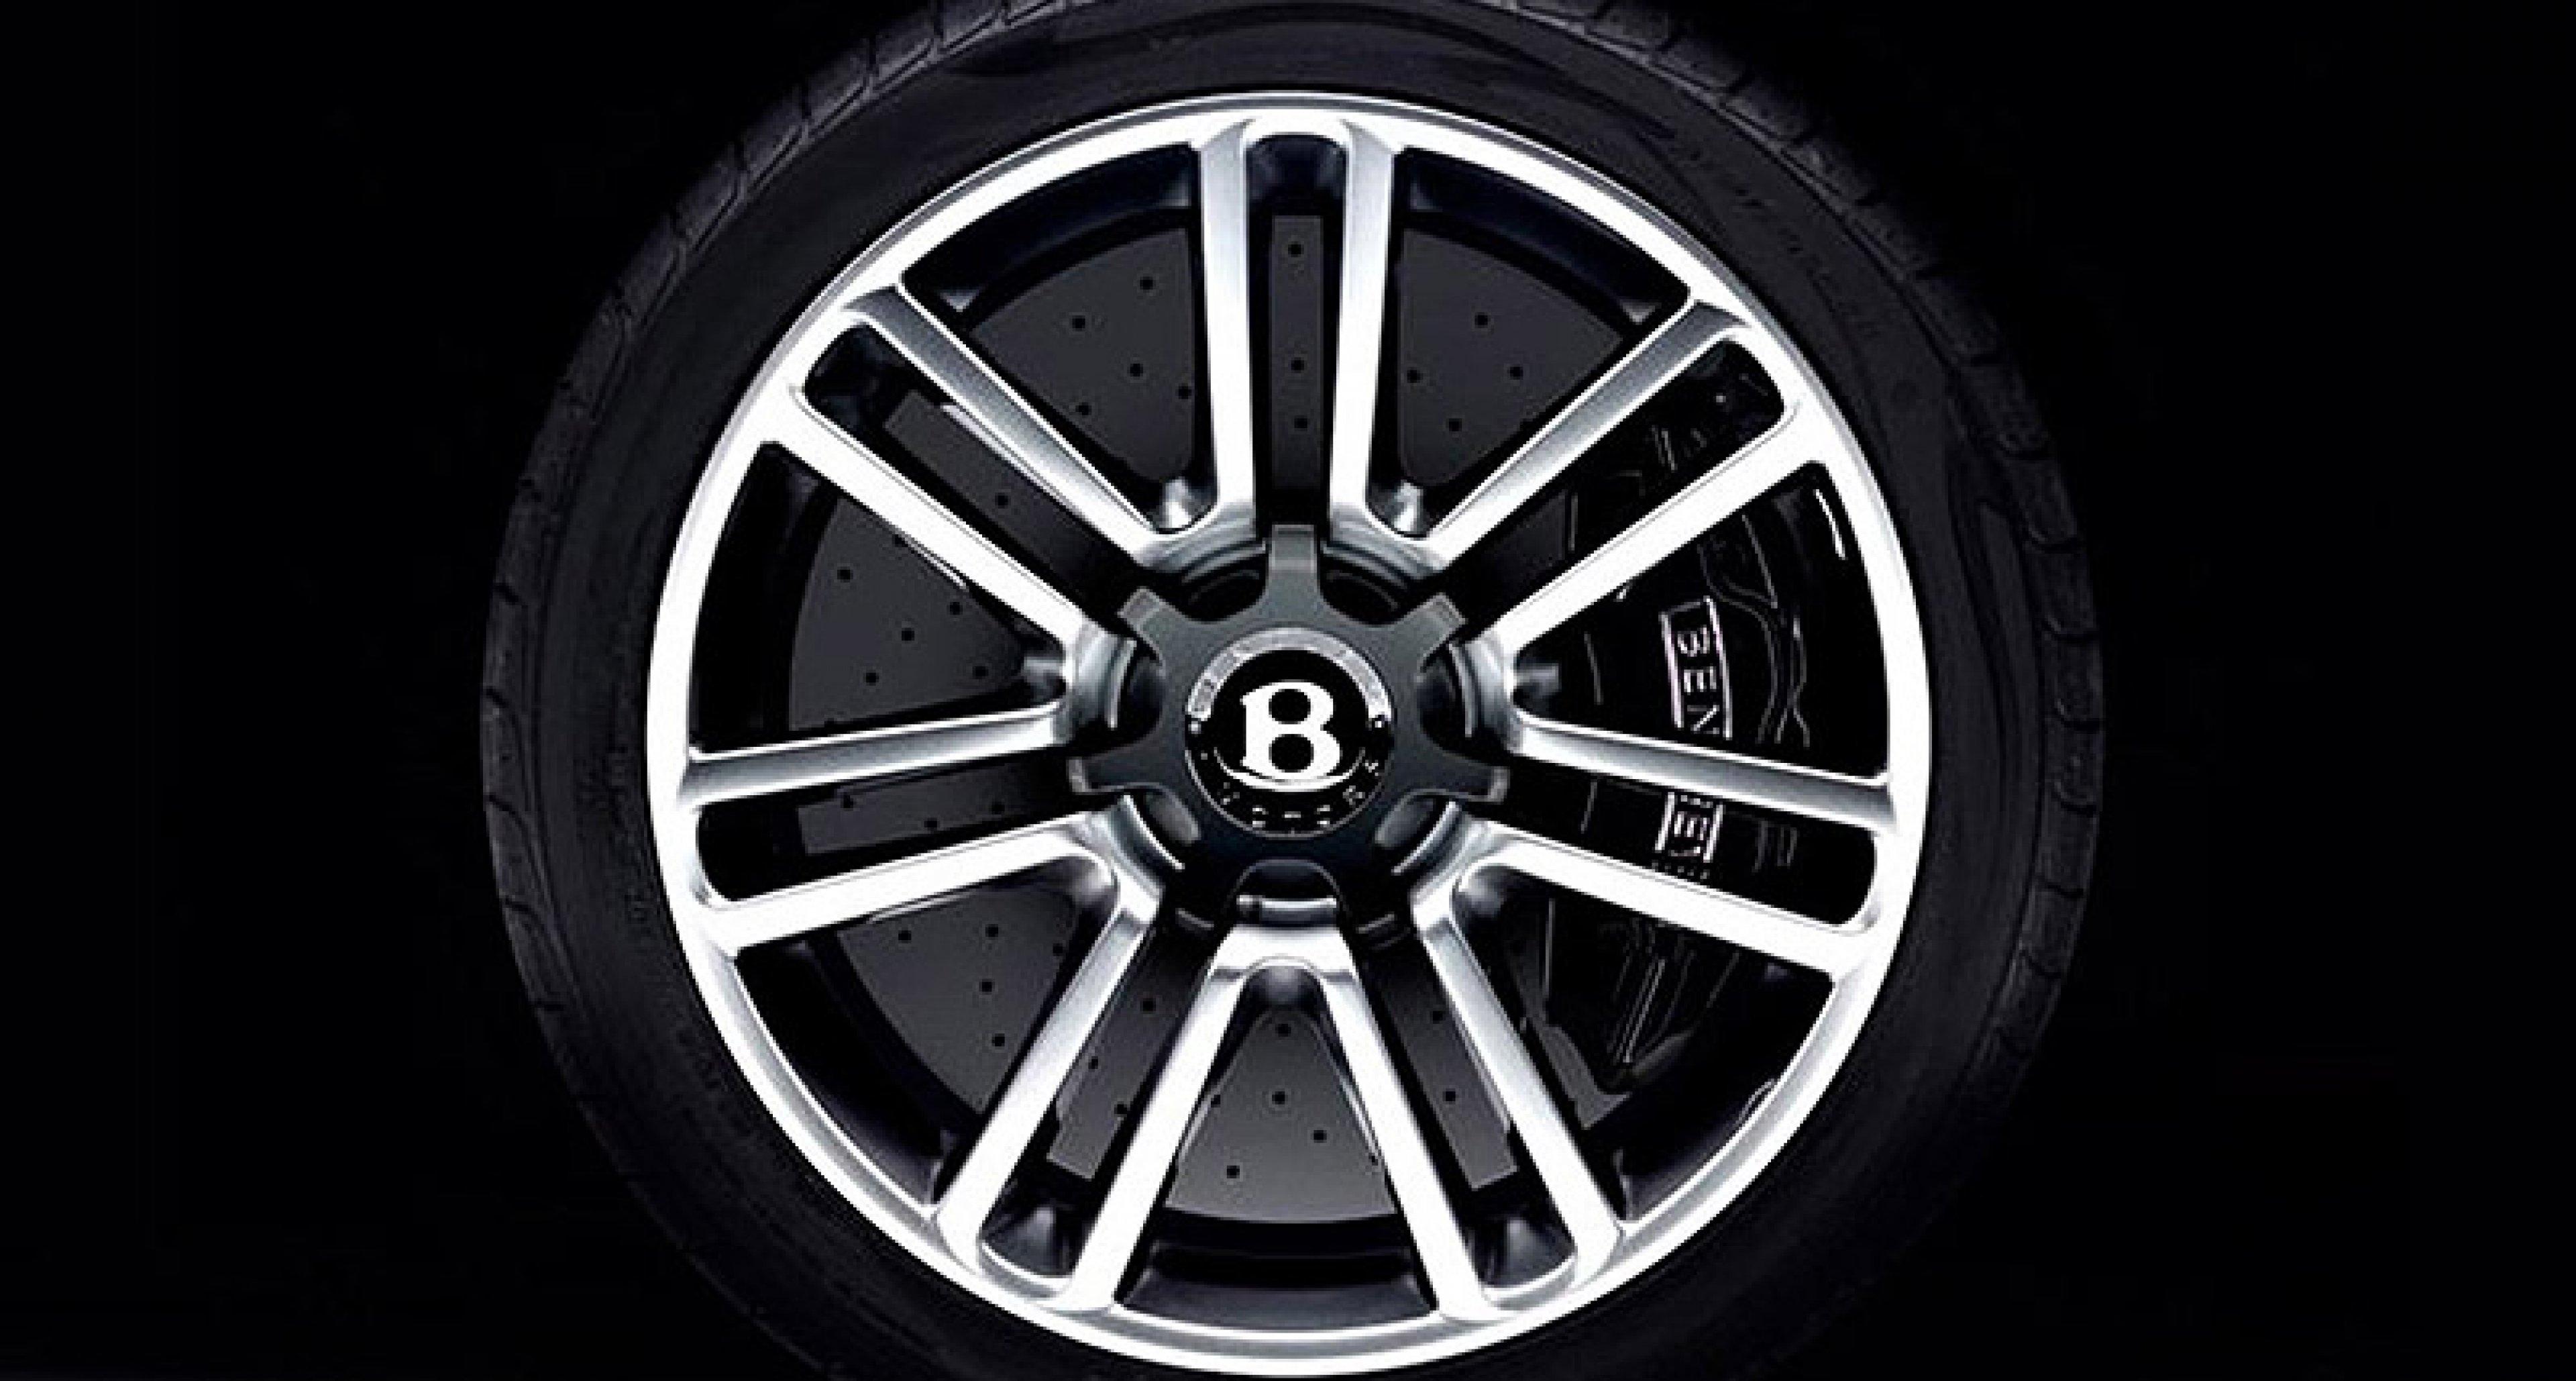 Bentley Continental Series 51: Colour Management